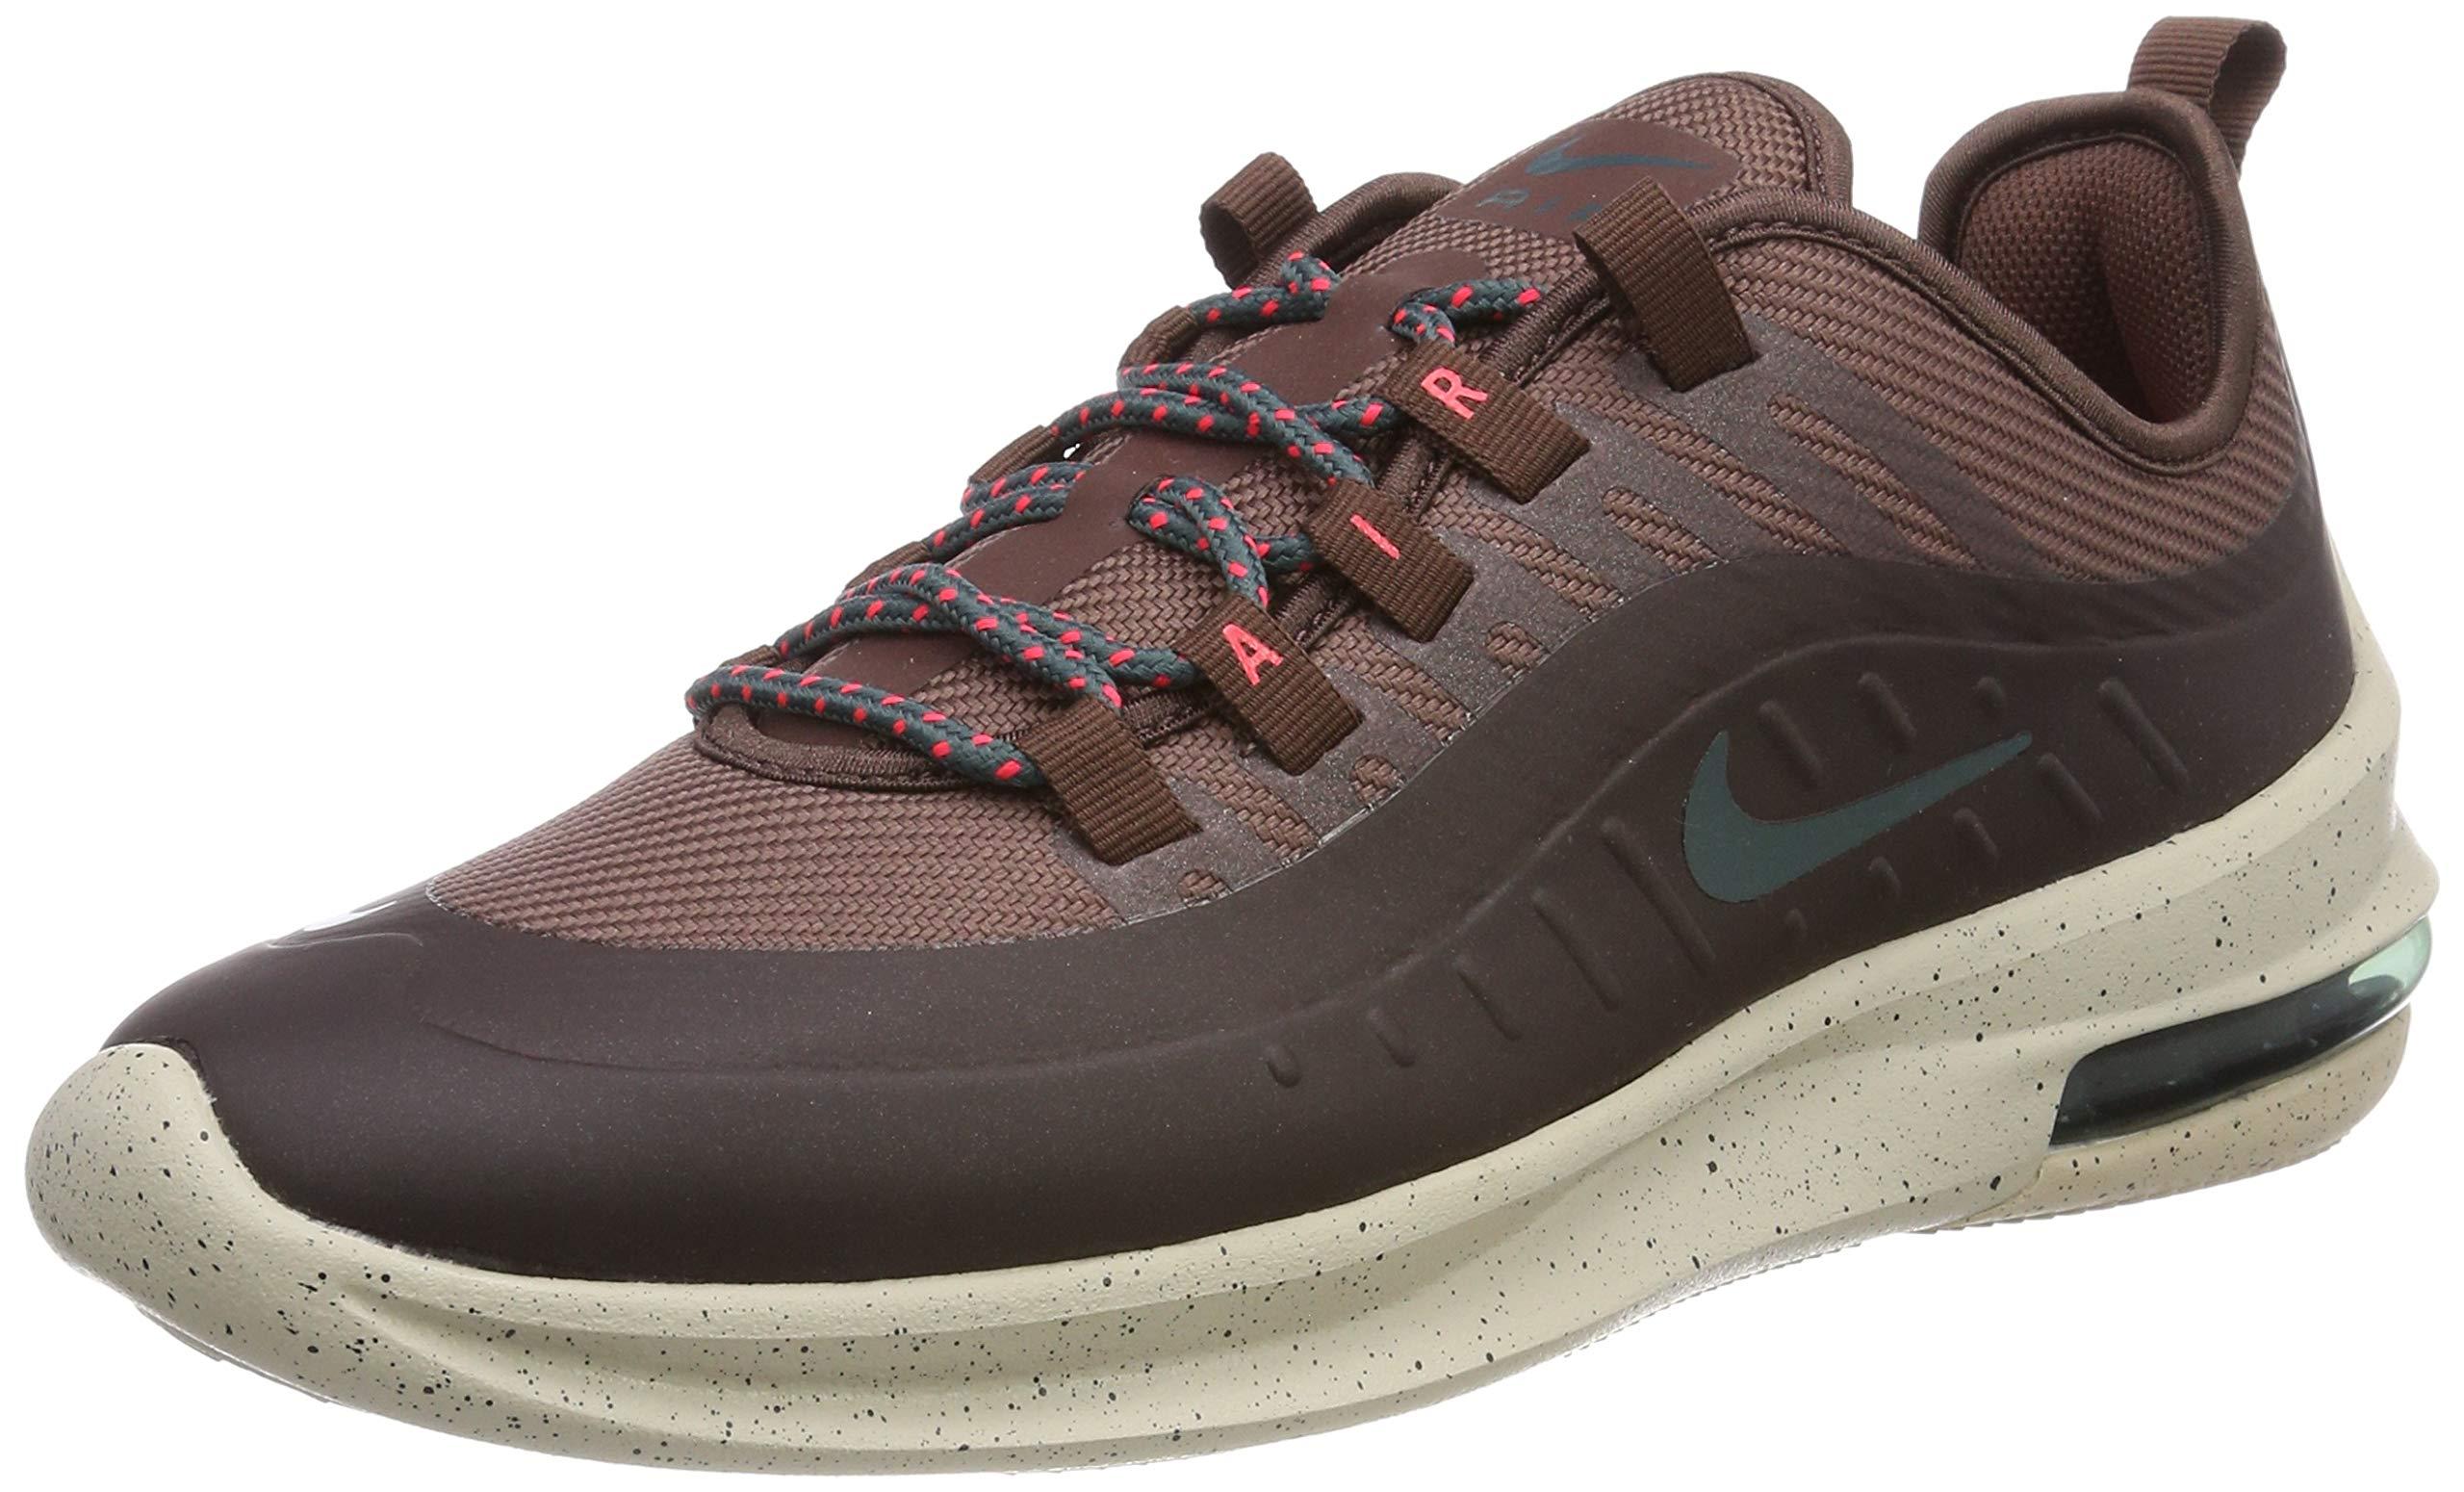 separation shoes 6d44c 51e5f Nike Men s Air Max Axis Prem Fitness Shoes